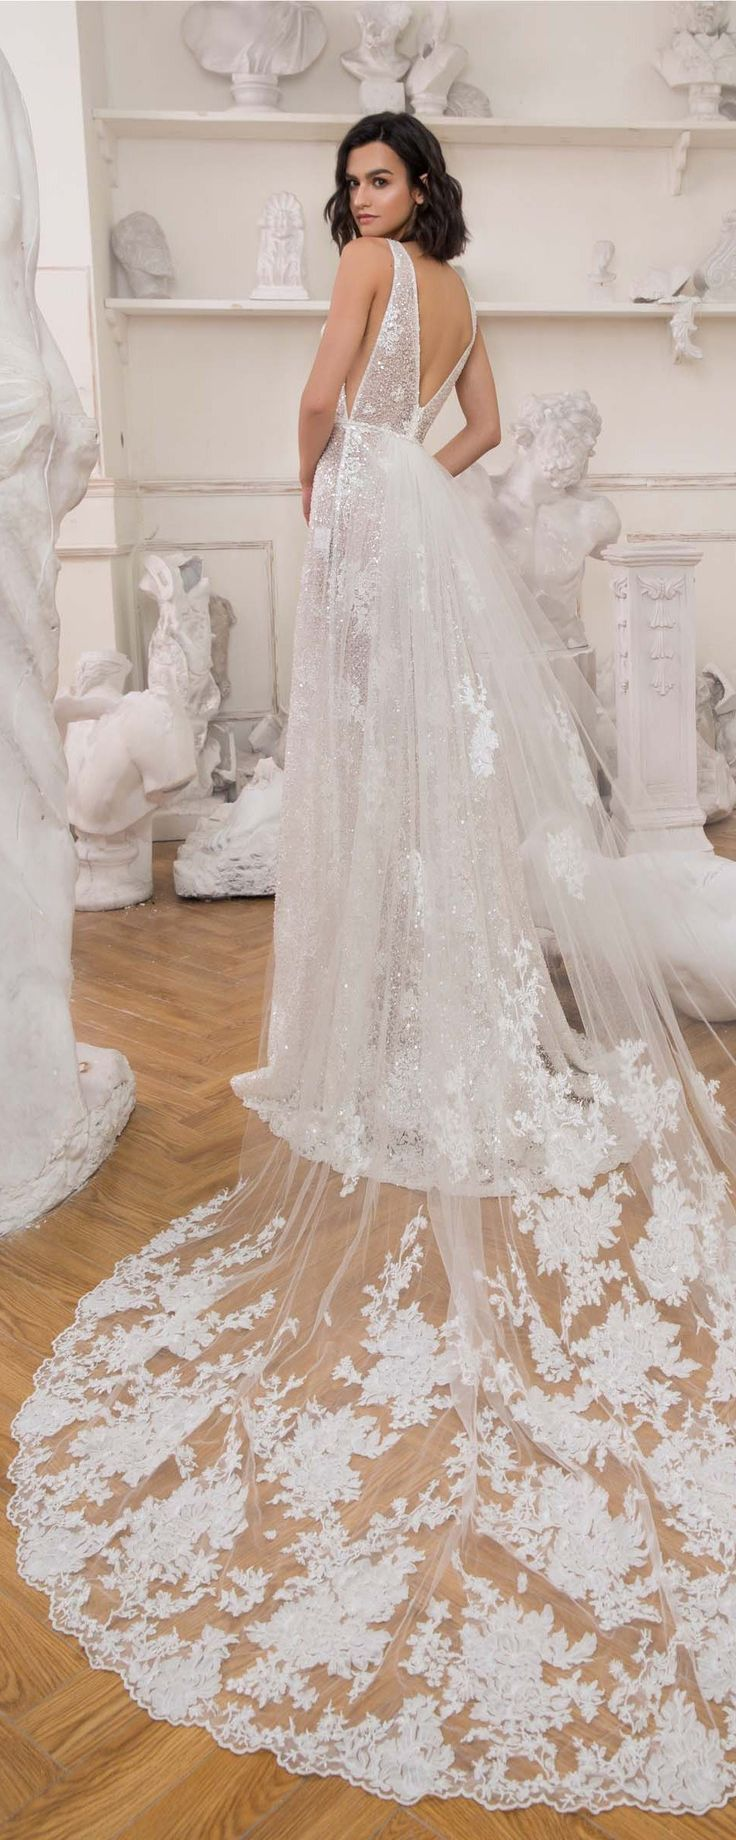 Dany Tabet Springsummer 2020 Bridal in 2020 Bridal